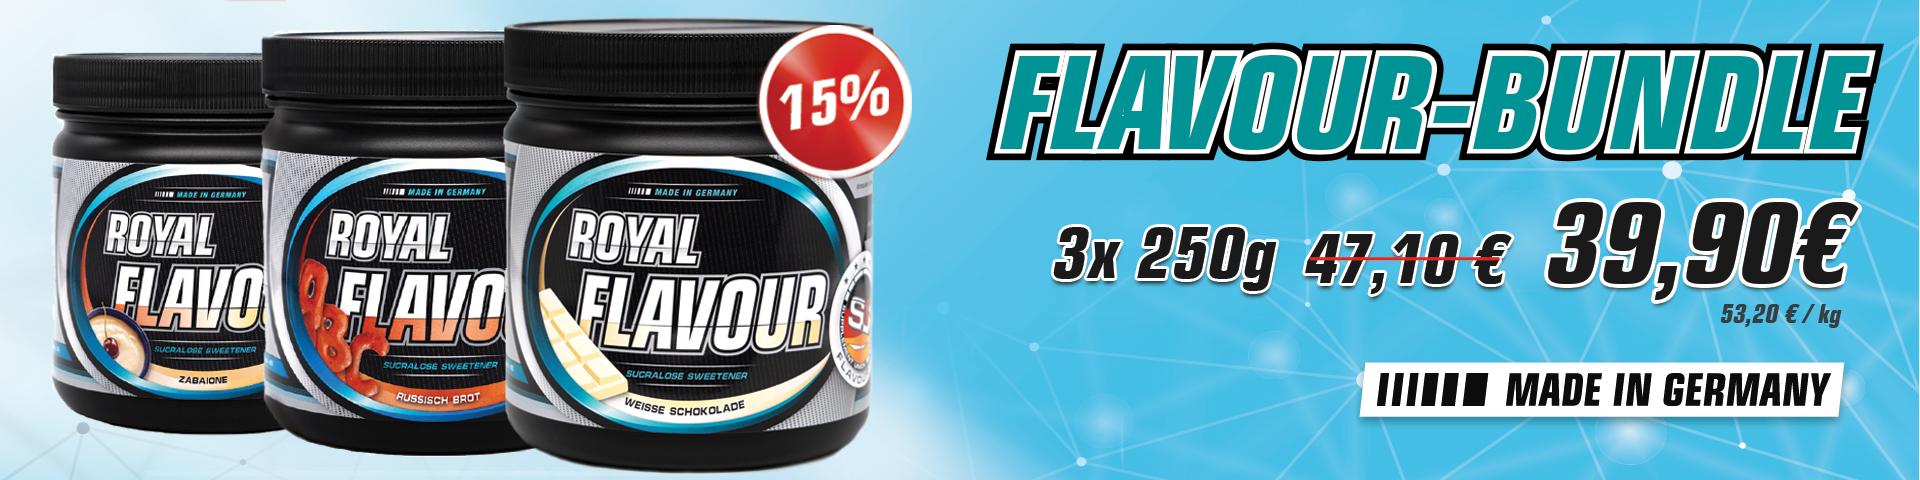 flavour-bundle-februar.jpg